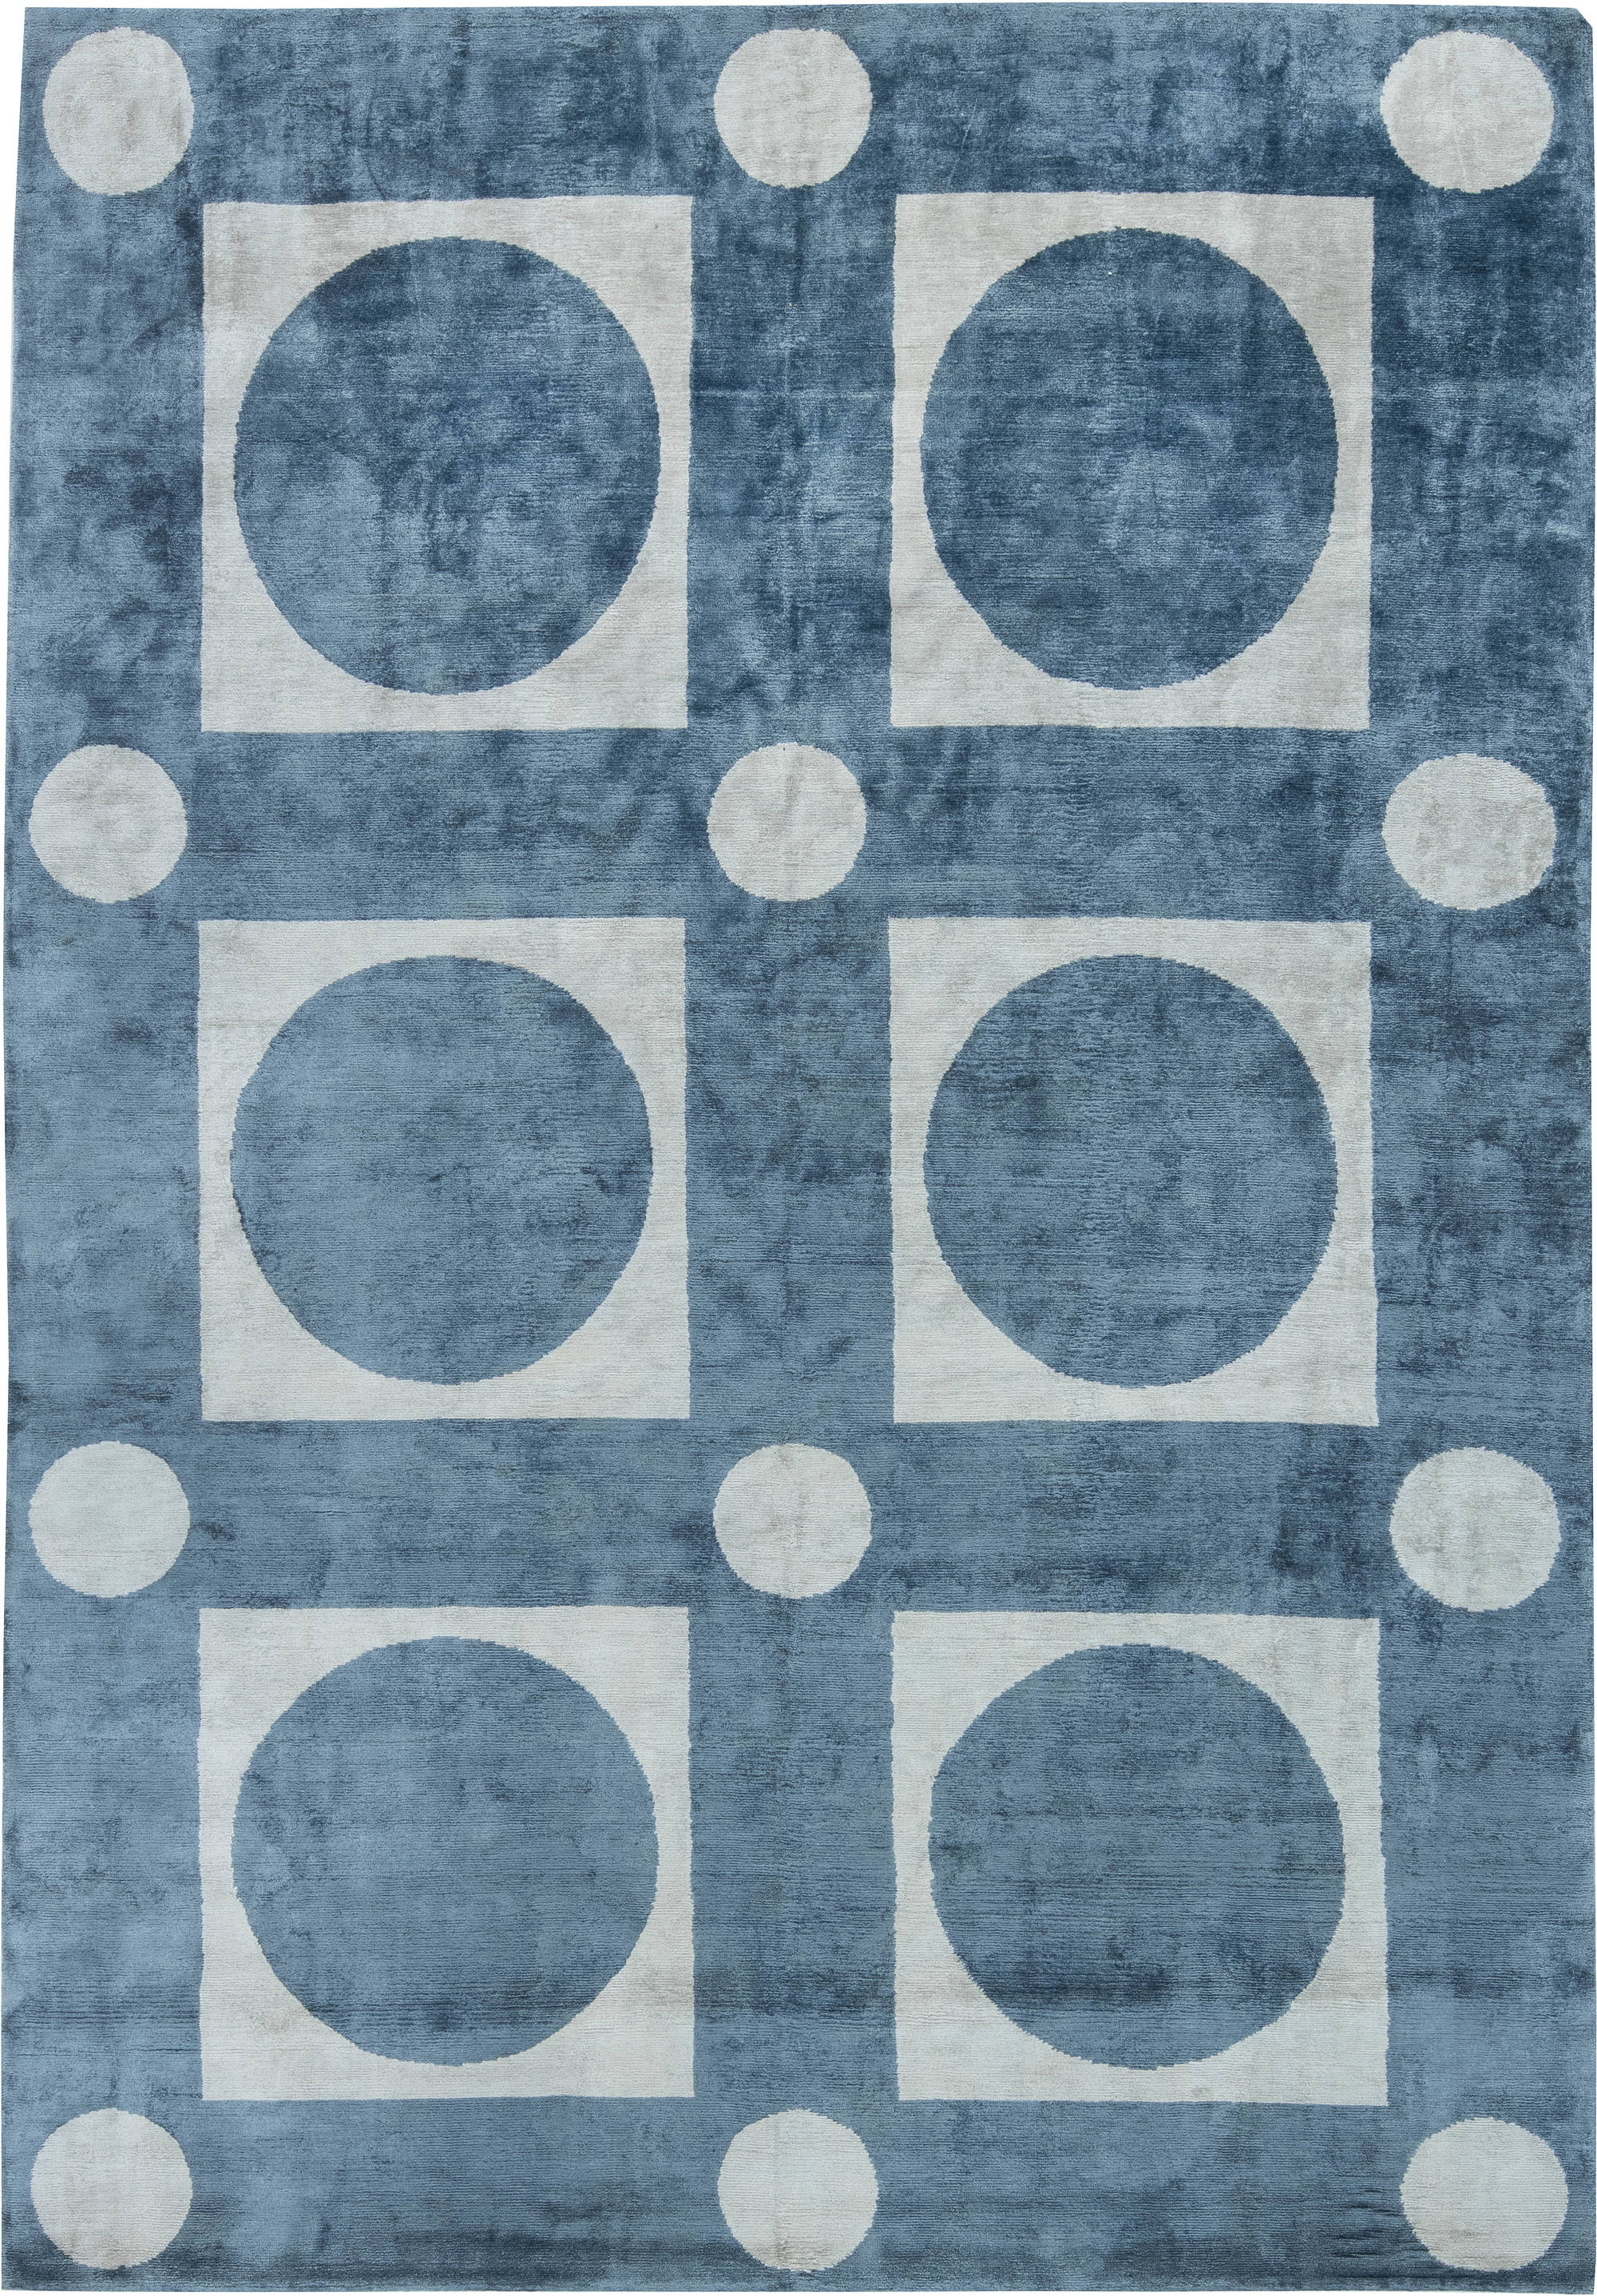 designer rugs tibetan silk designer rug TQMWXGD